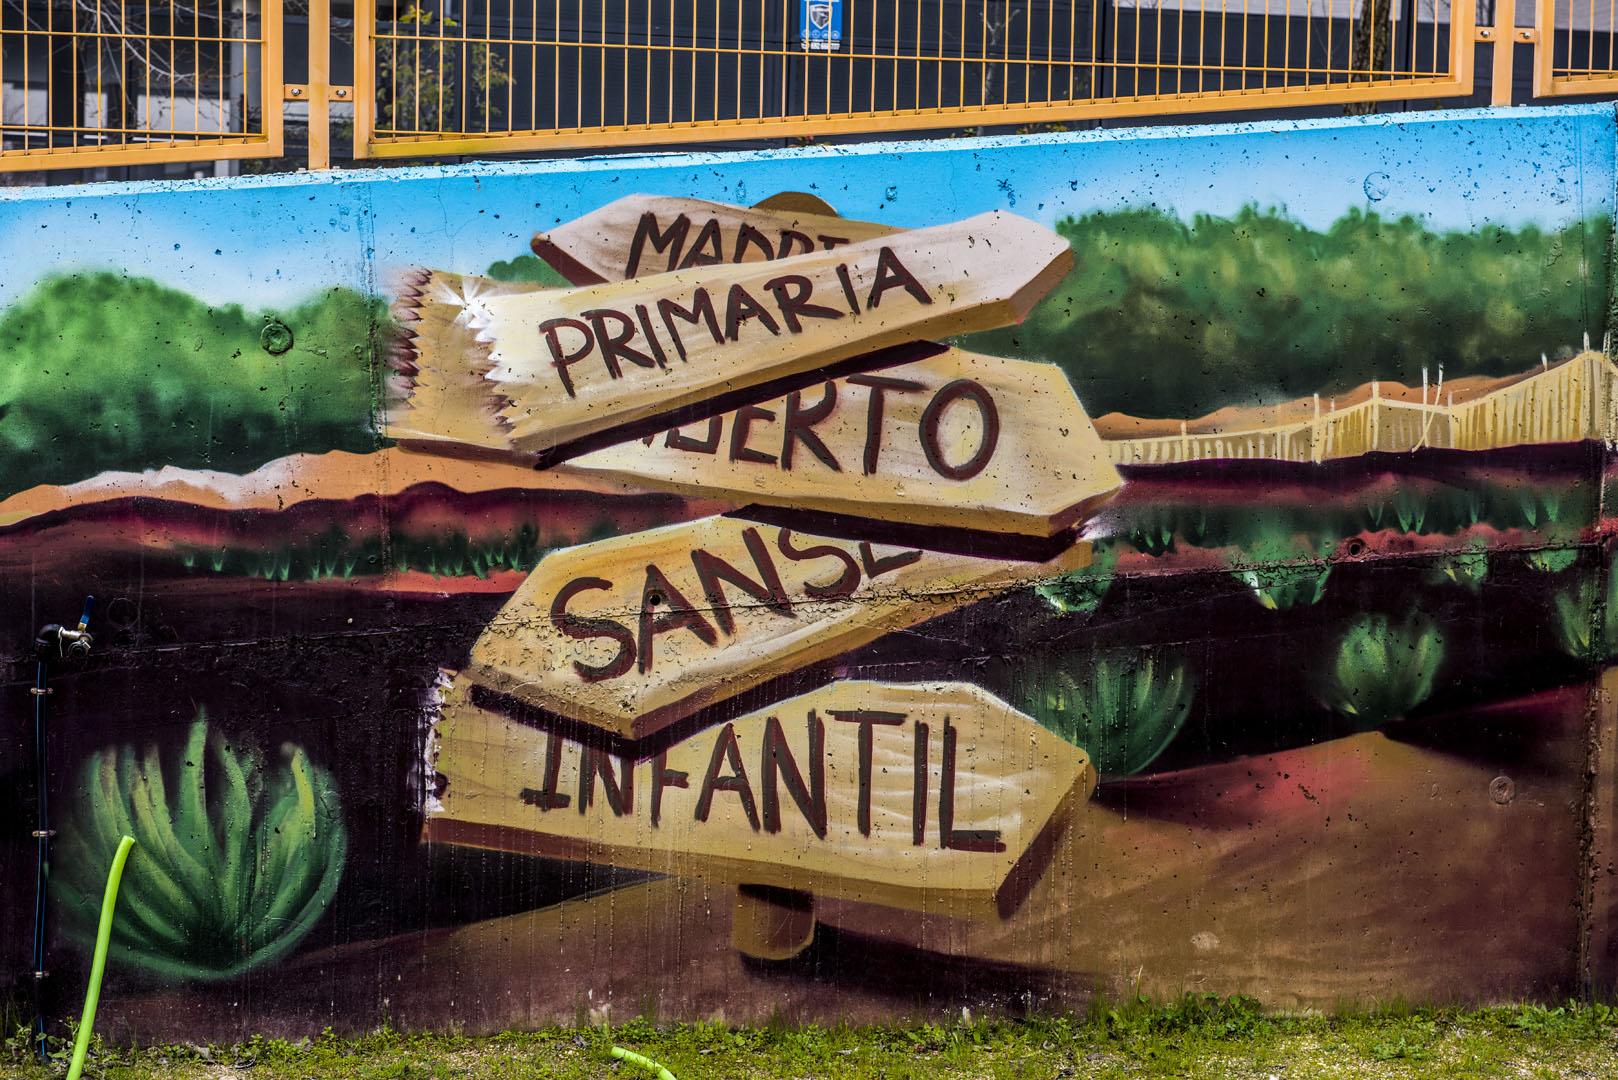 http://www.colegiotempranales.com/images/tempranales/centro/galeria/HuertoCartel.jpg